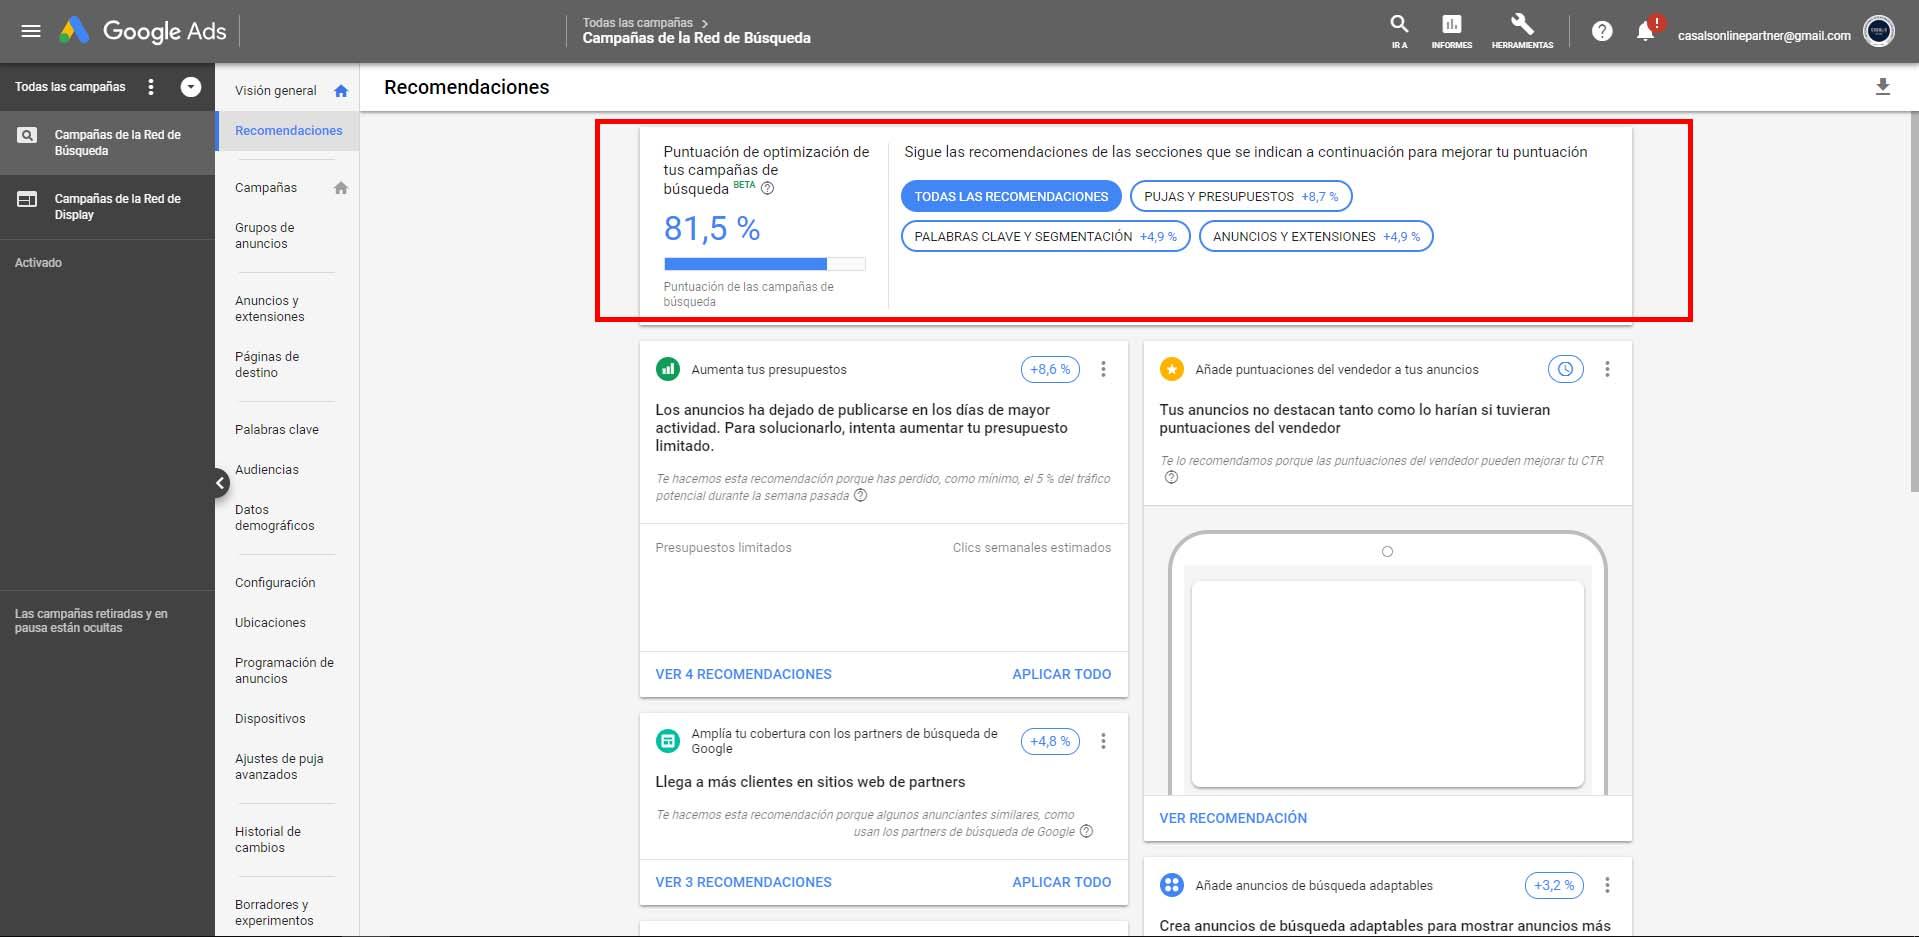 Google Ads: Campaign improvements